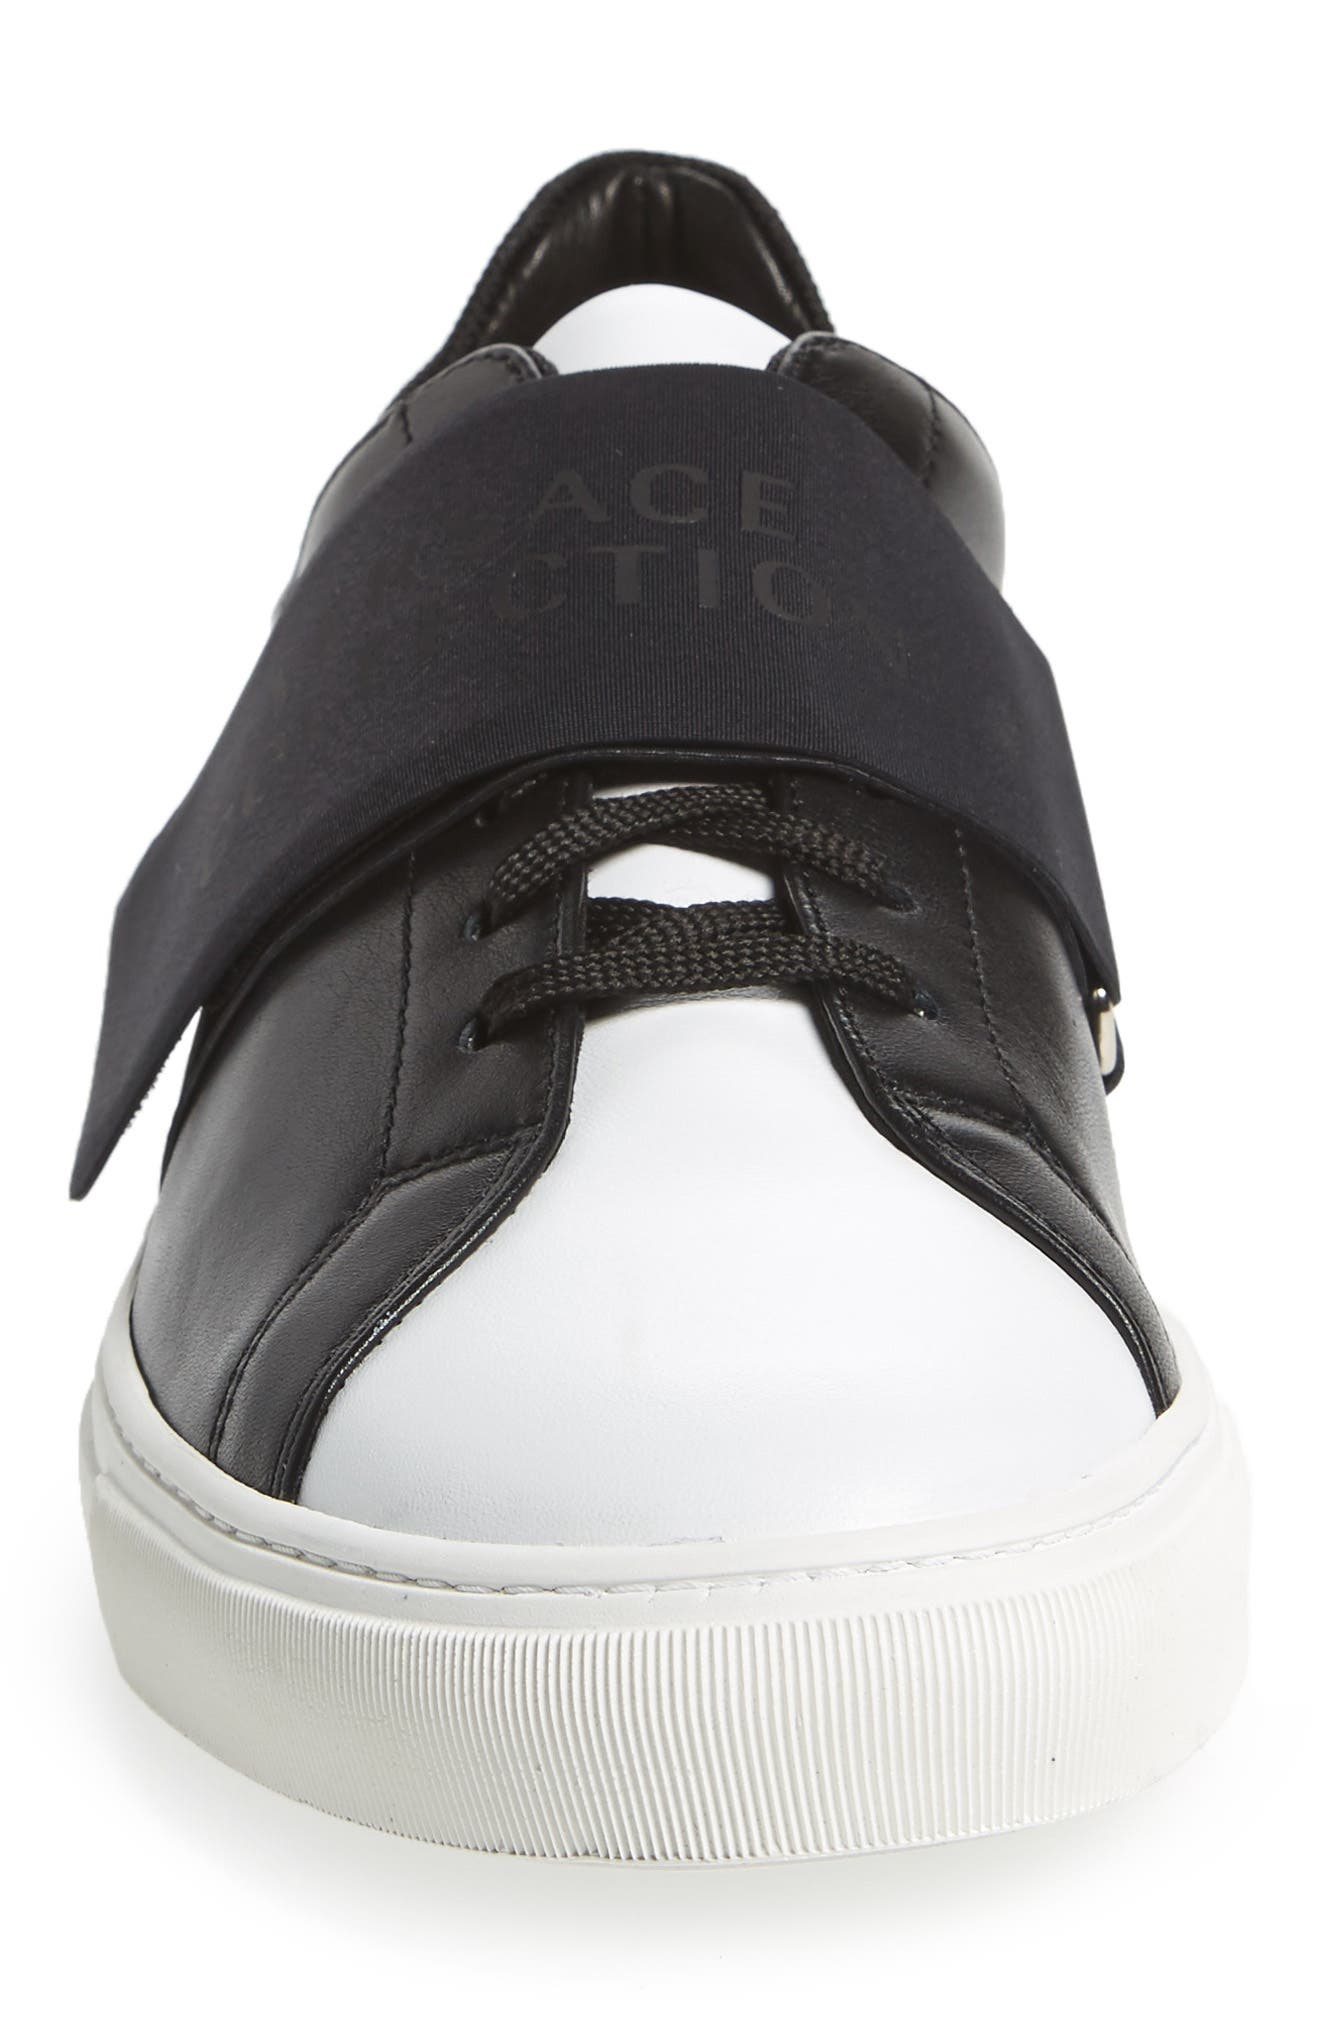 Strap Sneaker,                             Alternate thumbnail 4, color,                             Bianco/ Nero Leather